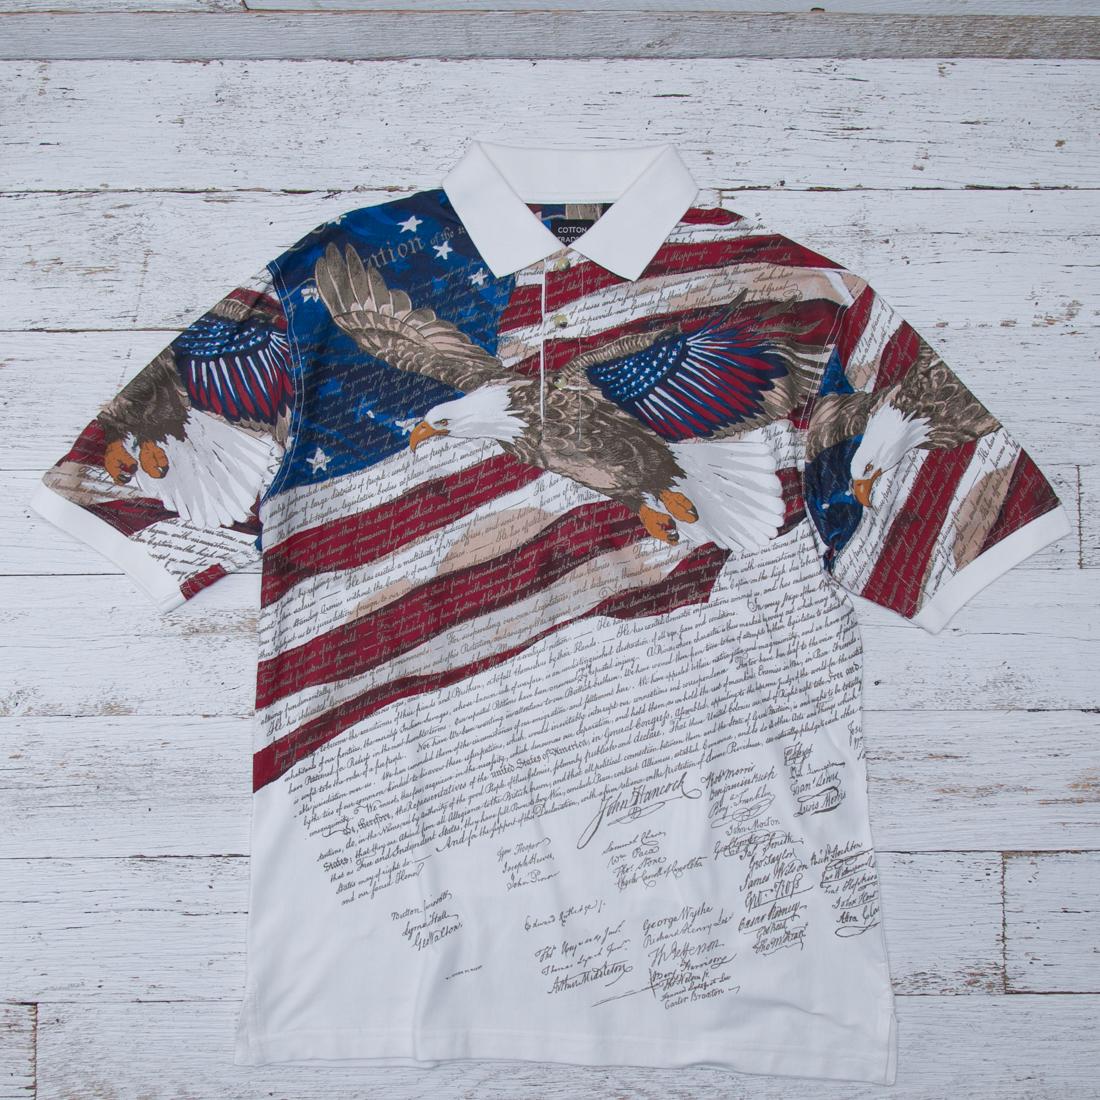 216620b4 Shirts T-Shirts   Mens   Clothing Accessories - Cracker Barrel